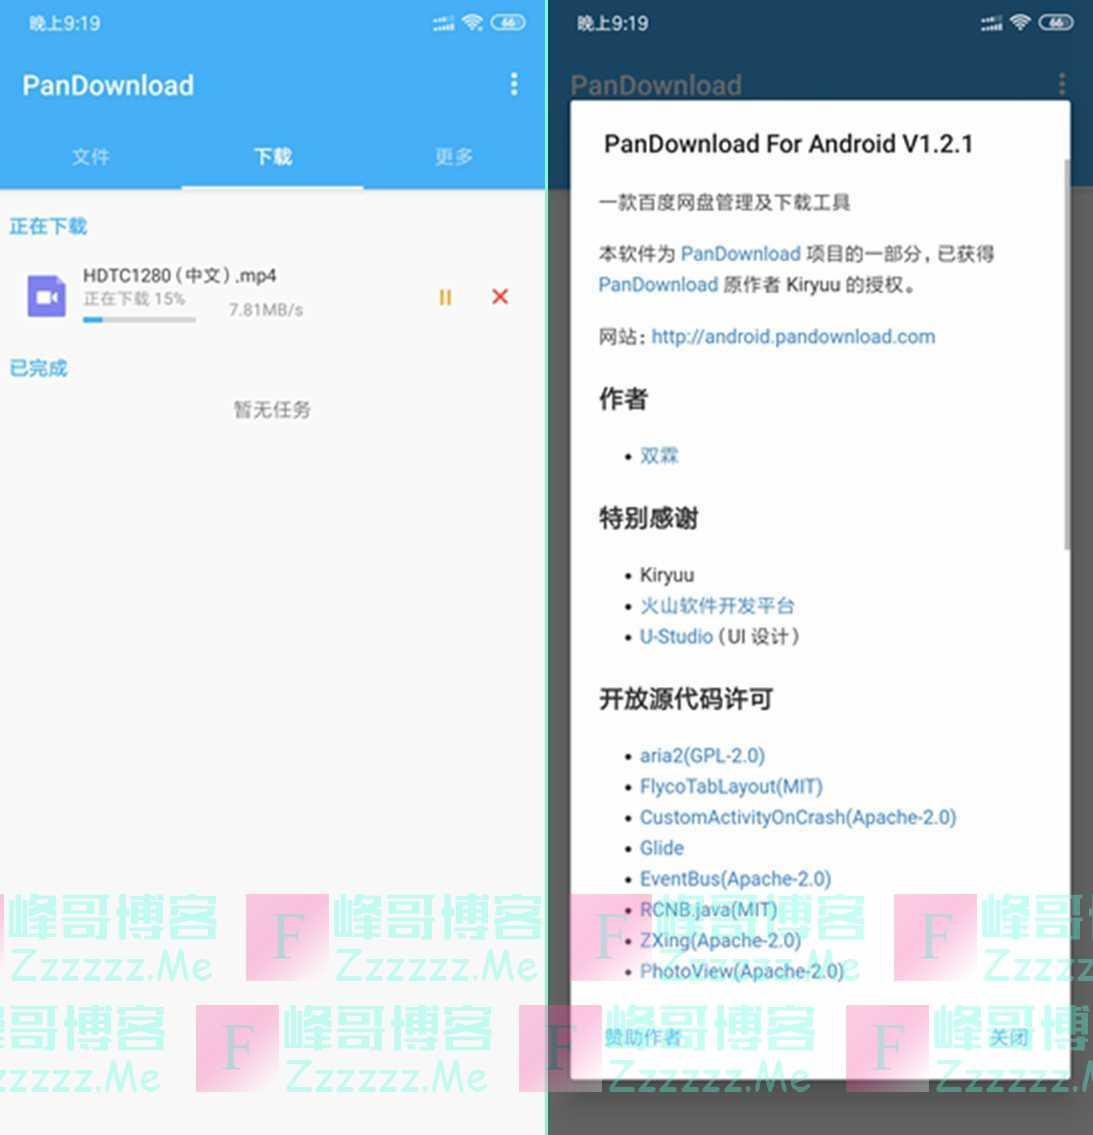 Pandownload V1.2.1 安卓最新可用百度云不限速下载工具 亲测满速下载